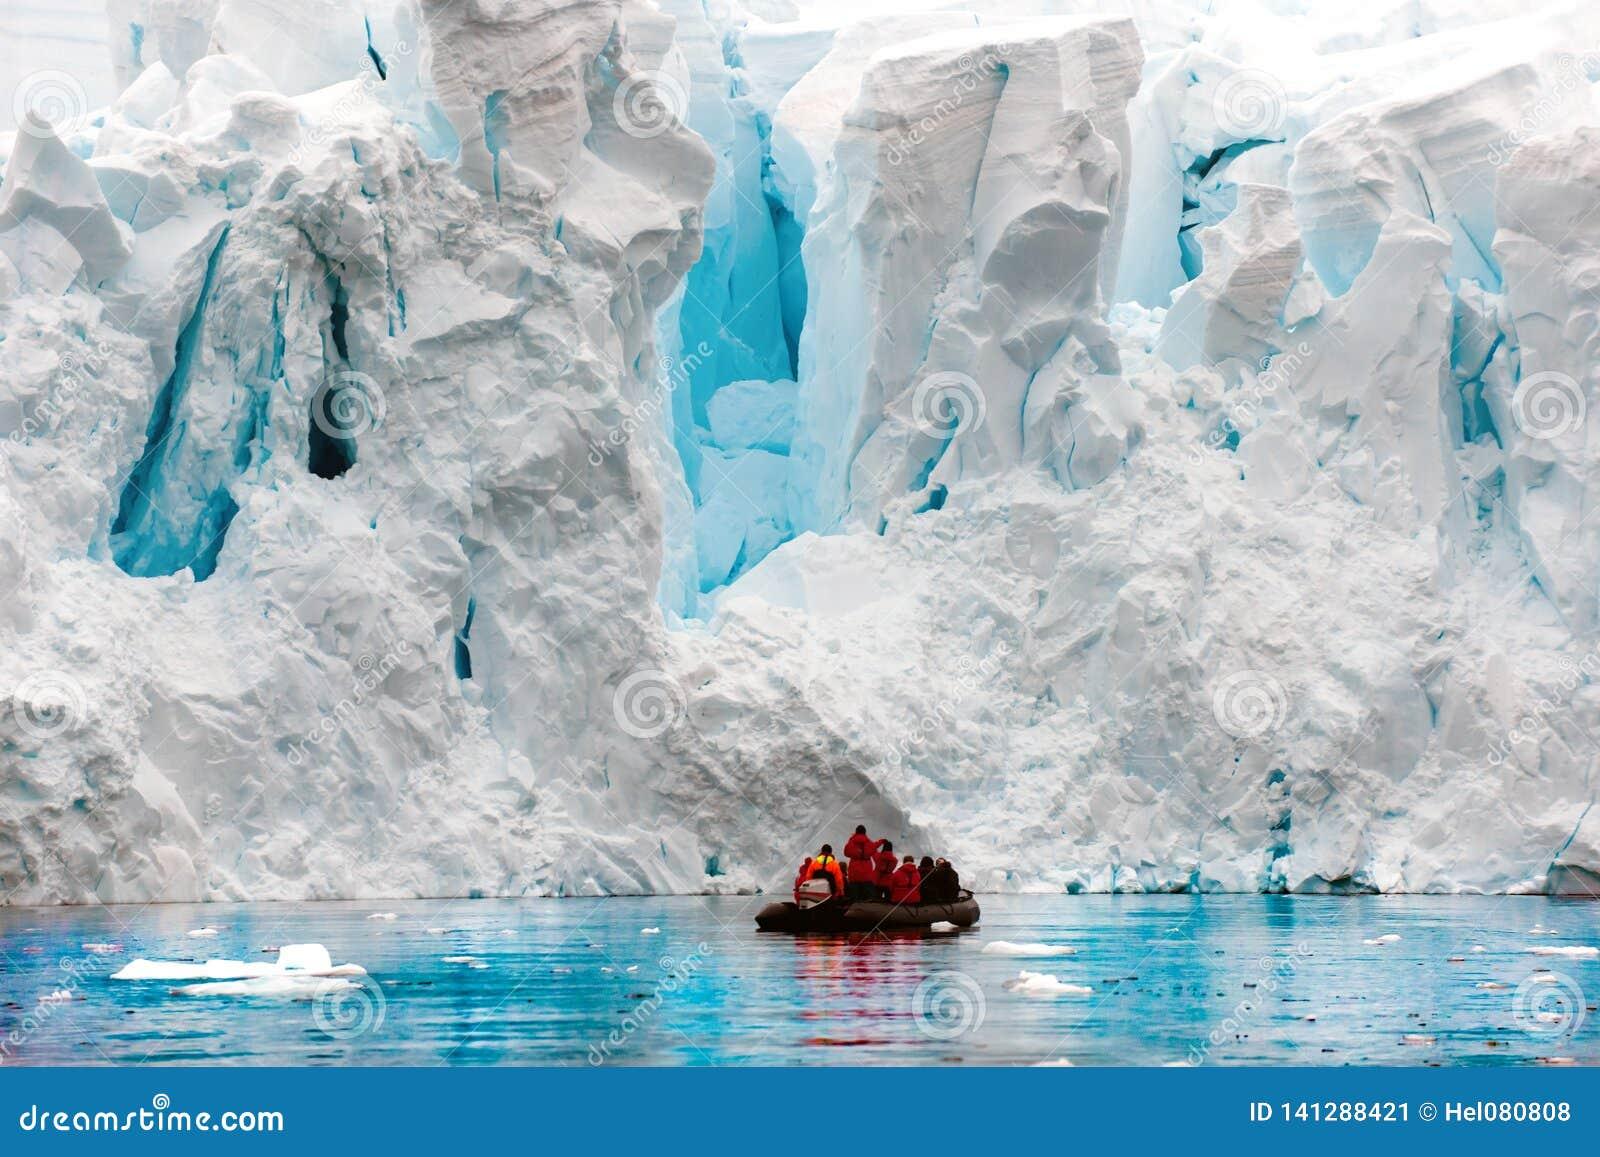 Glacier calving in Antarctic, people in Zodiac in front of escarpment of glacier